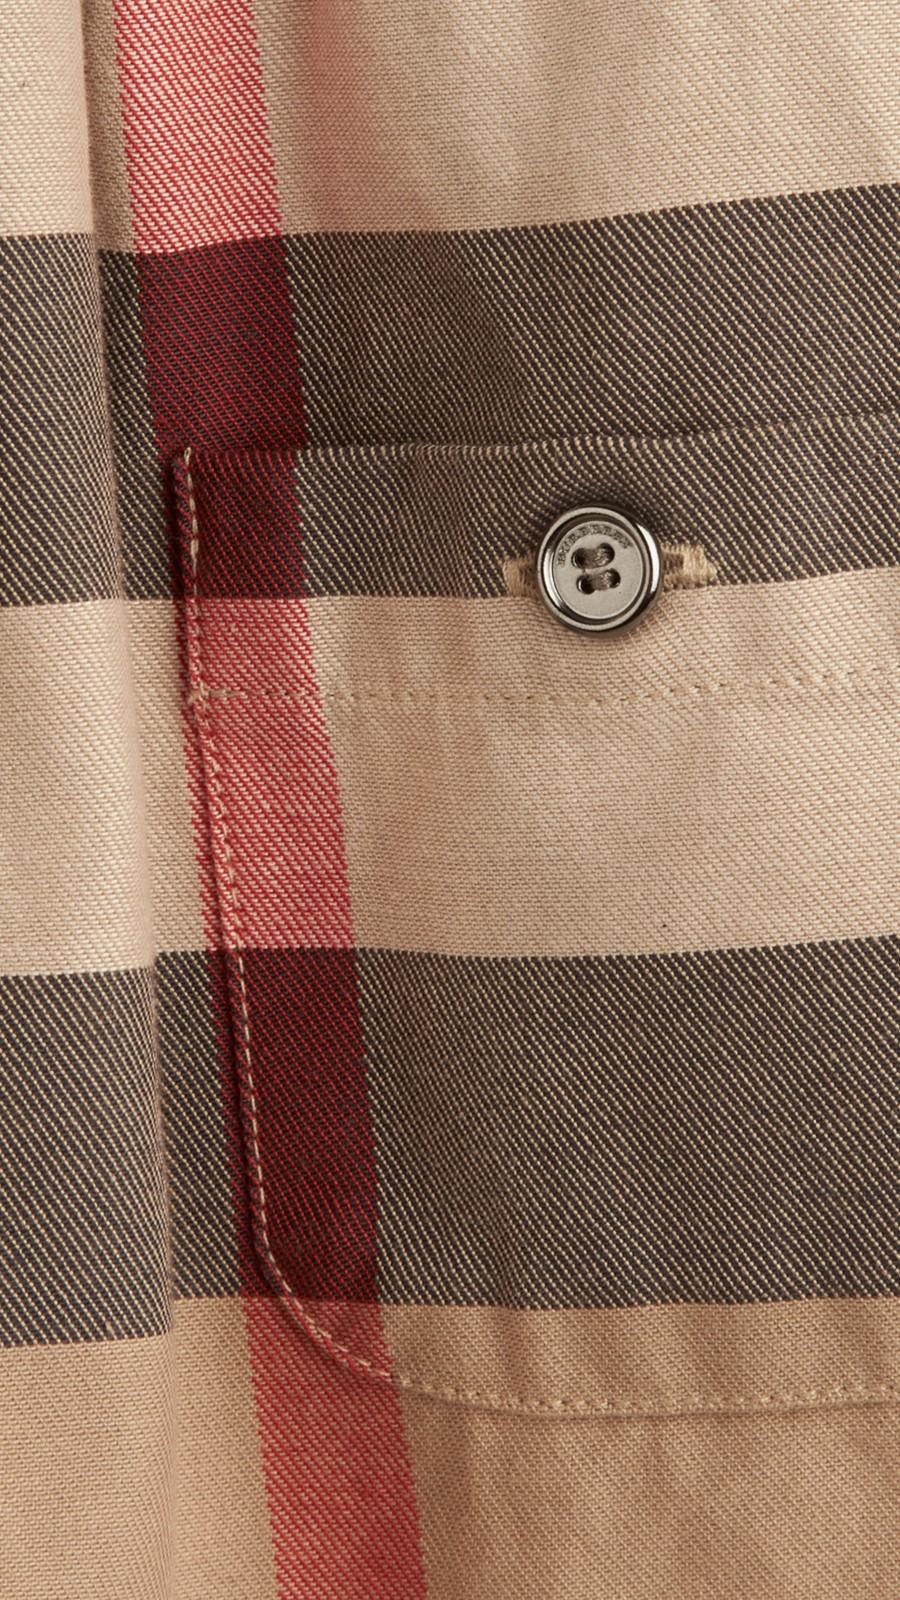 New classic Check Cotton Dress - Image 2